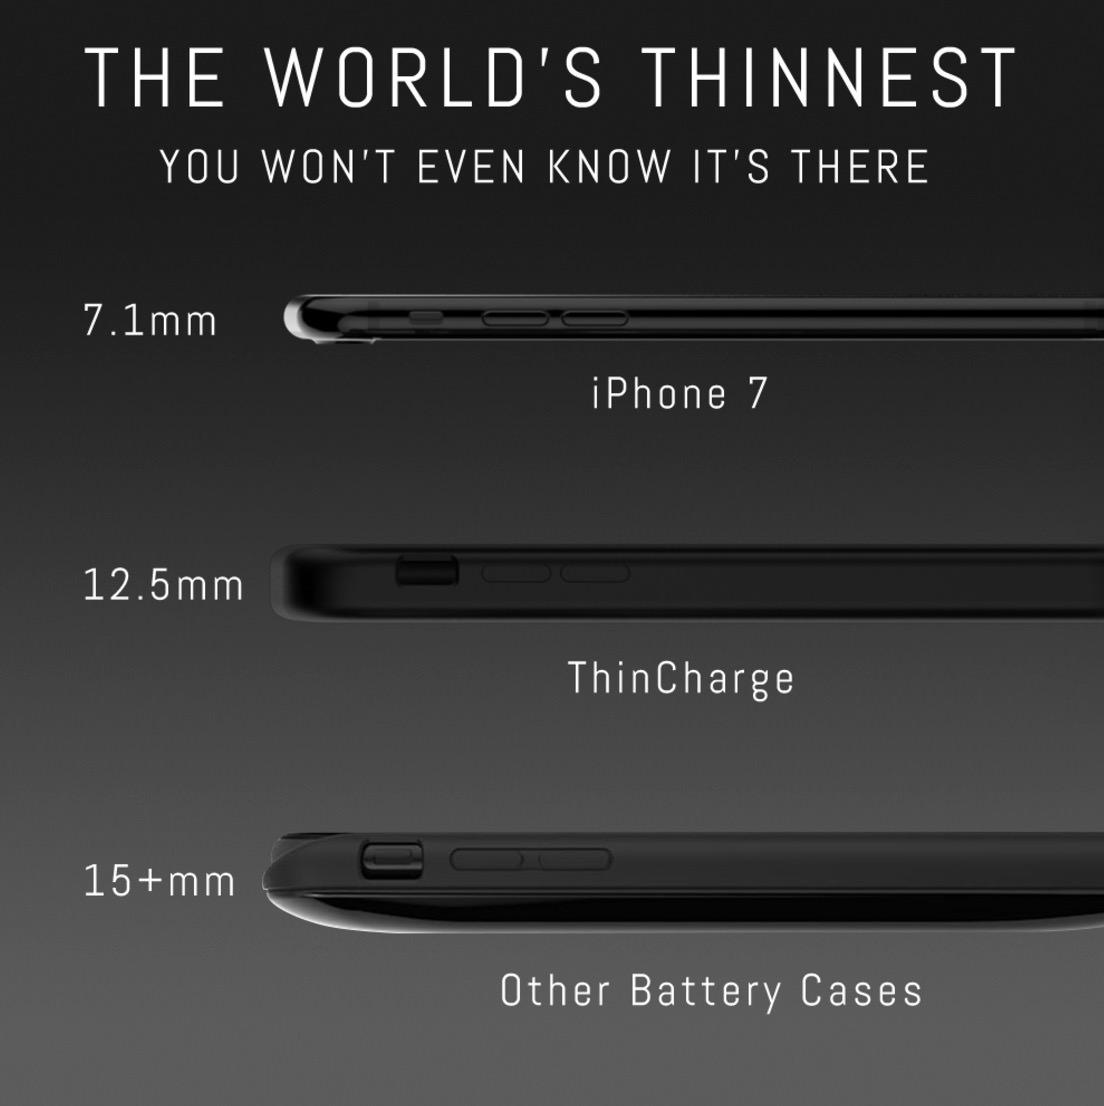 iPhone 7/7 Plus用の薄いバッテリー内蔵ケース「ThinCharge」